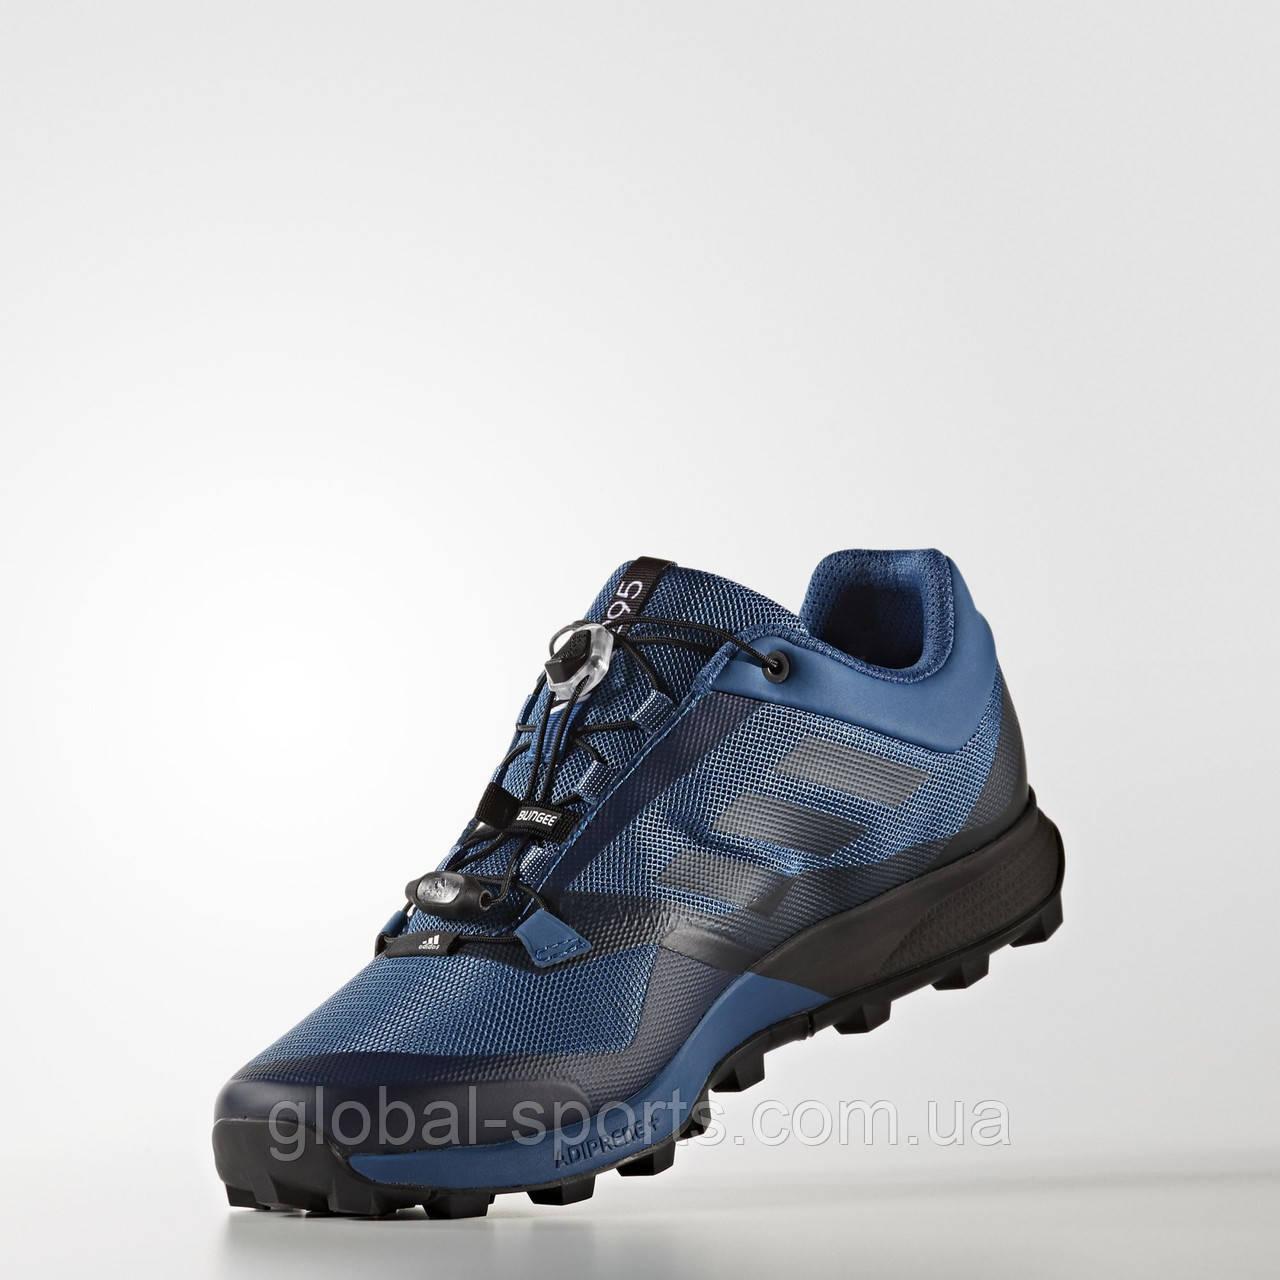 Мужские кроссовки Adidas Terrex Trail Maker (Артикул: BB3359)